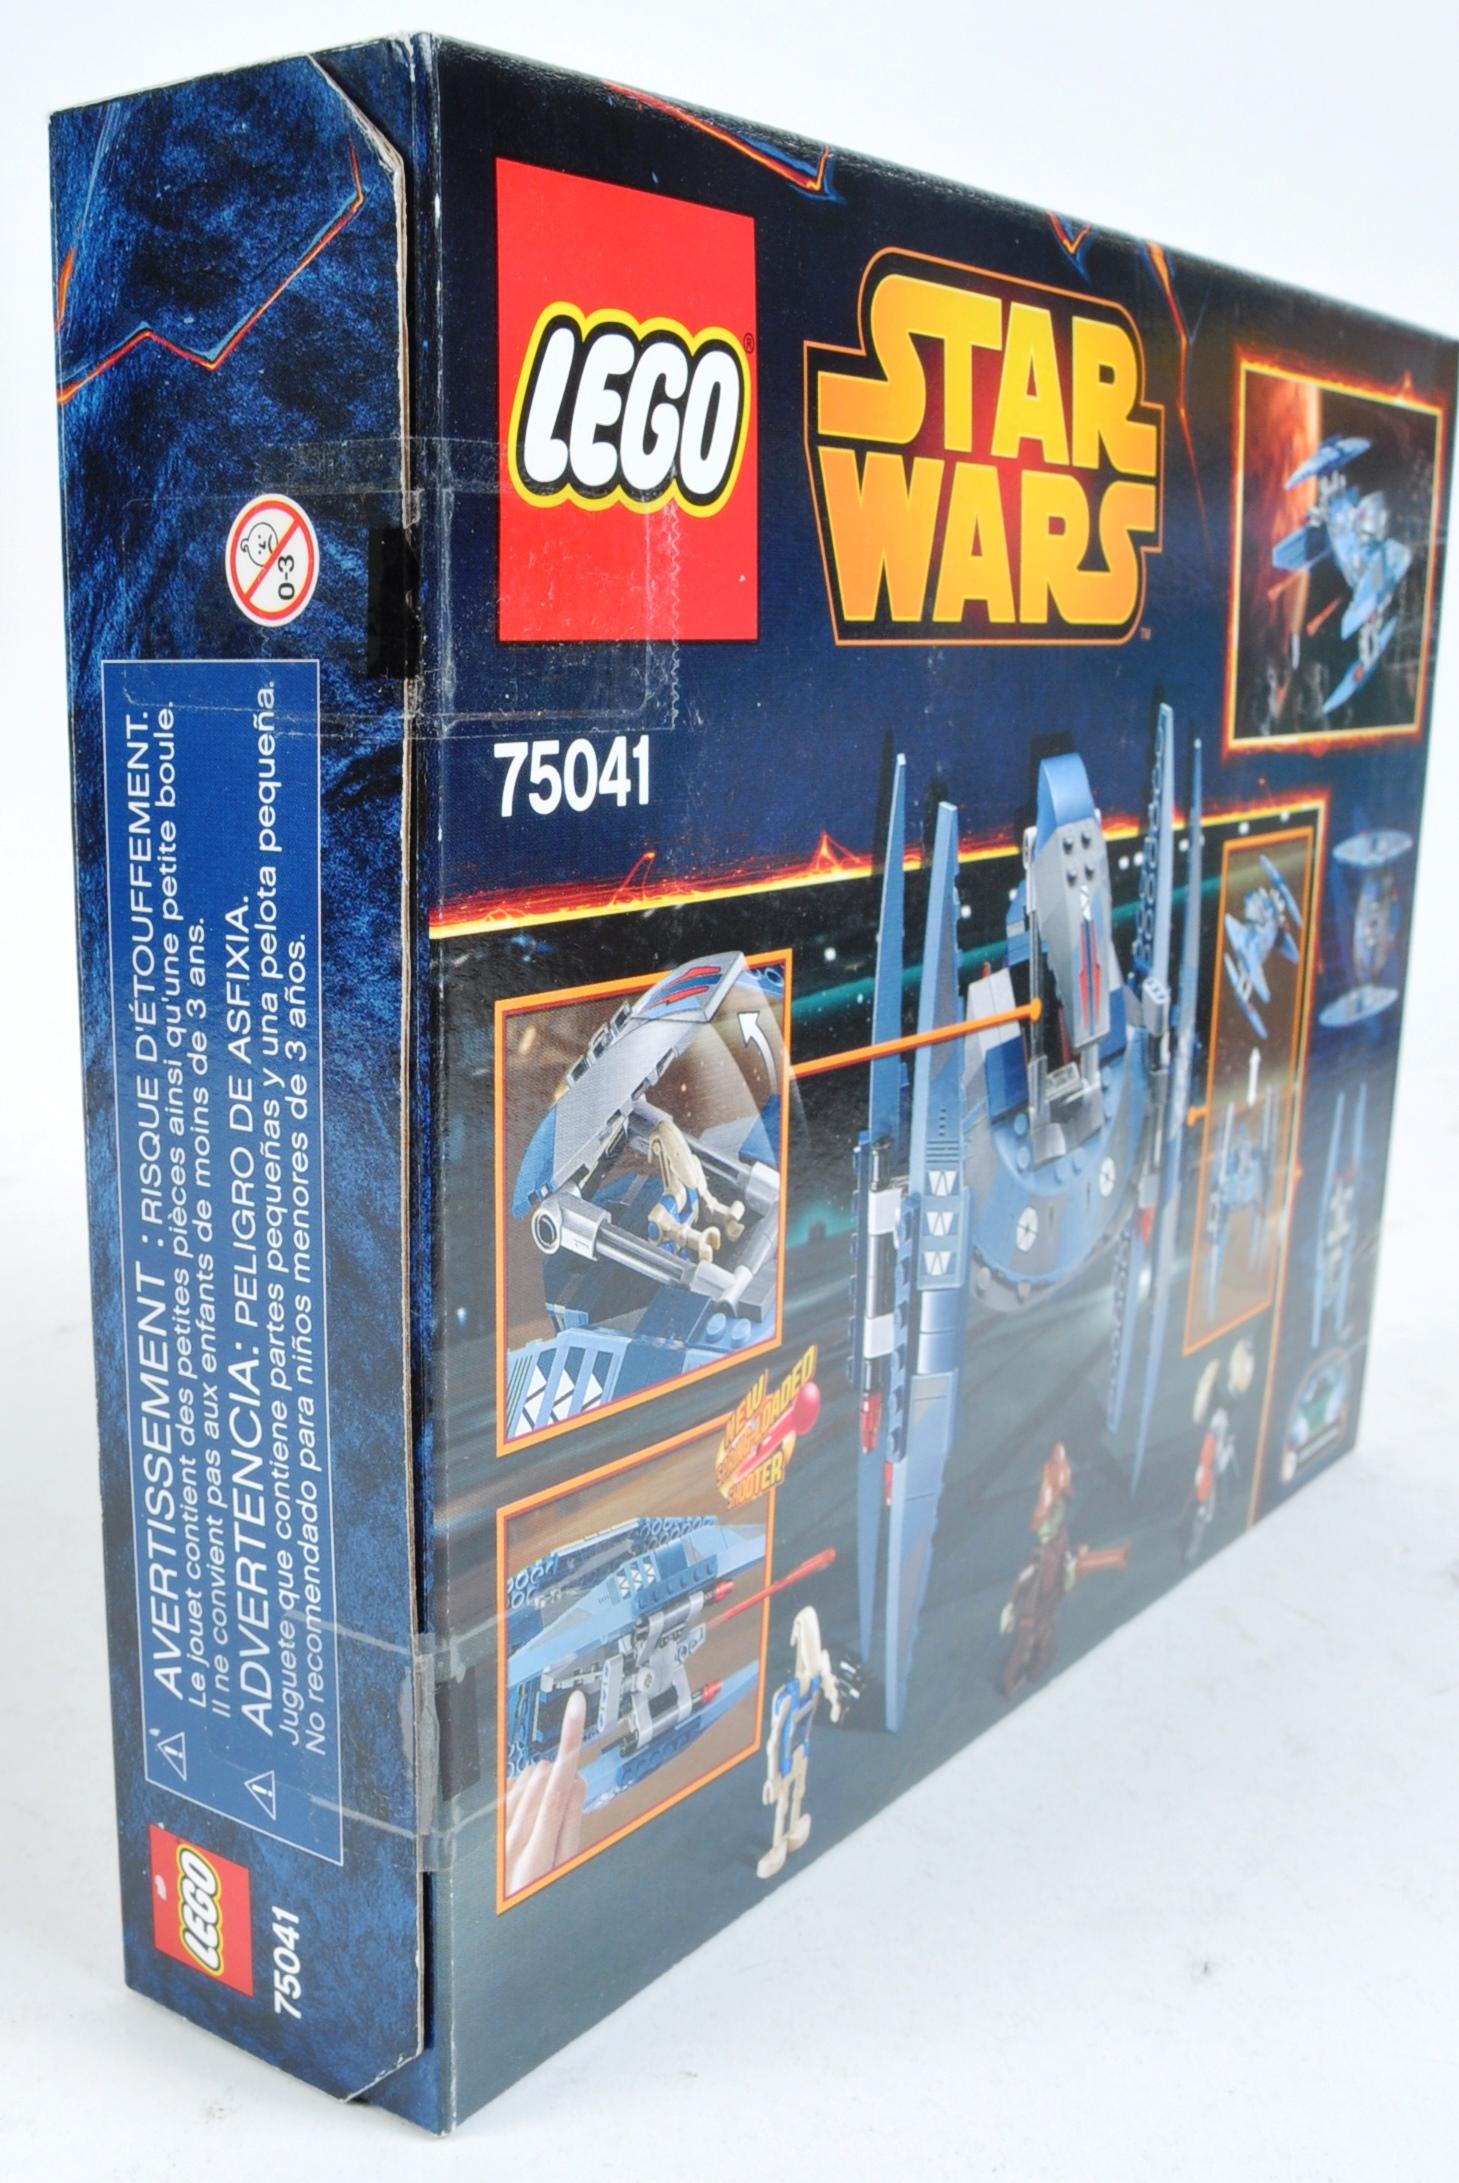 LEGO SETS - LEGO STAR WARS - 75041 / 75042 - Image 6 of 6